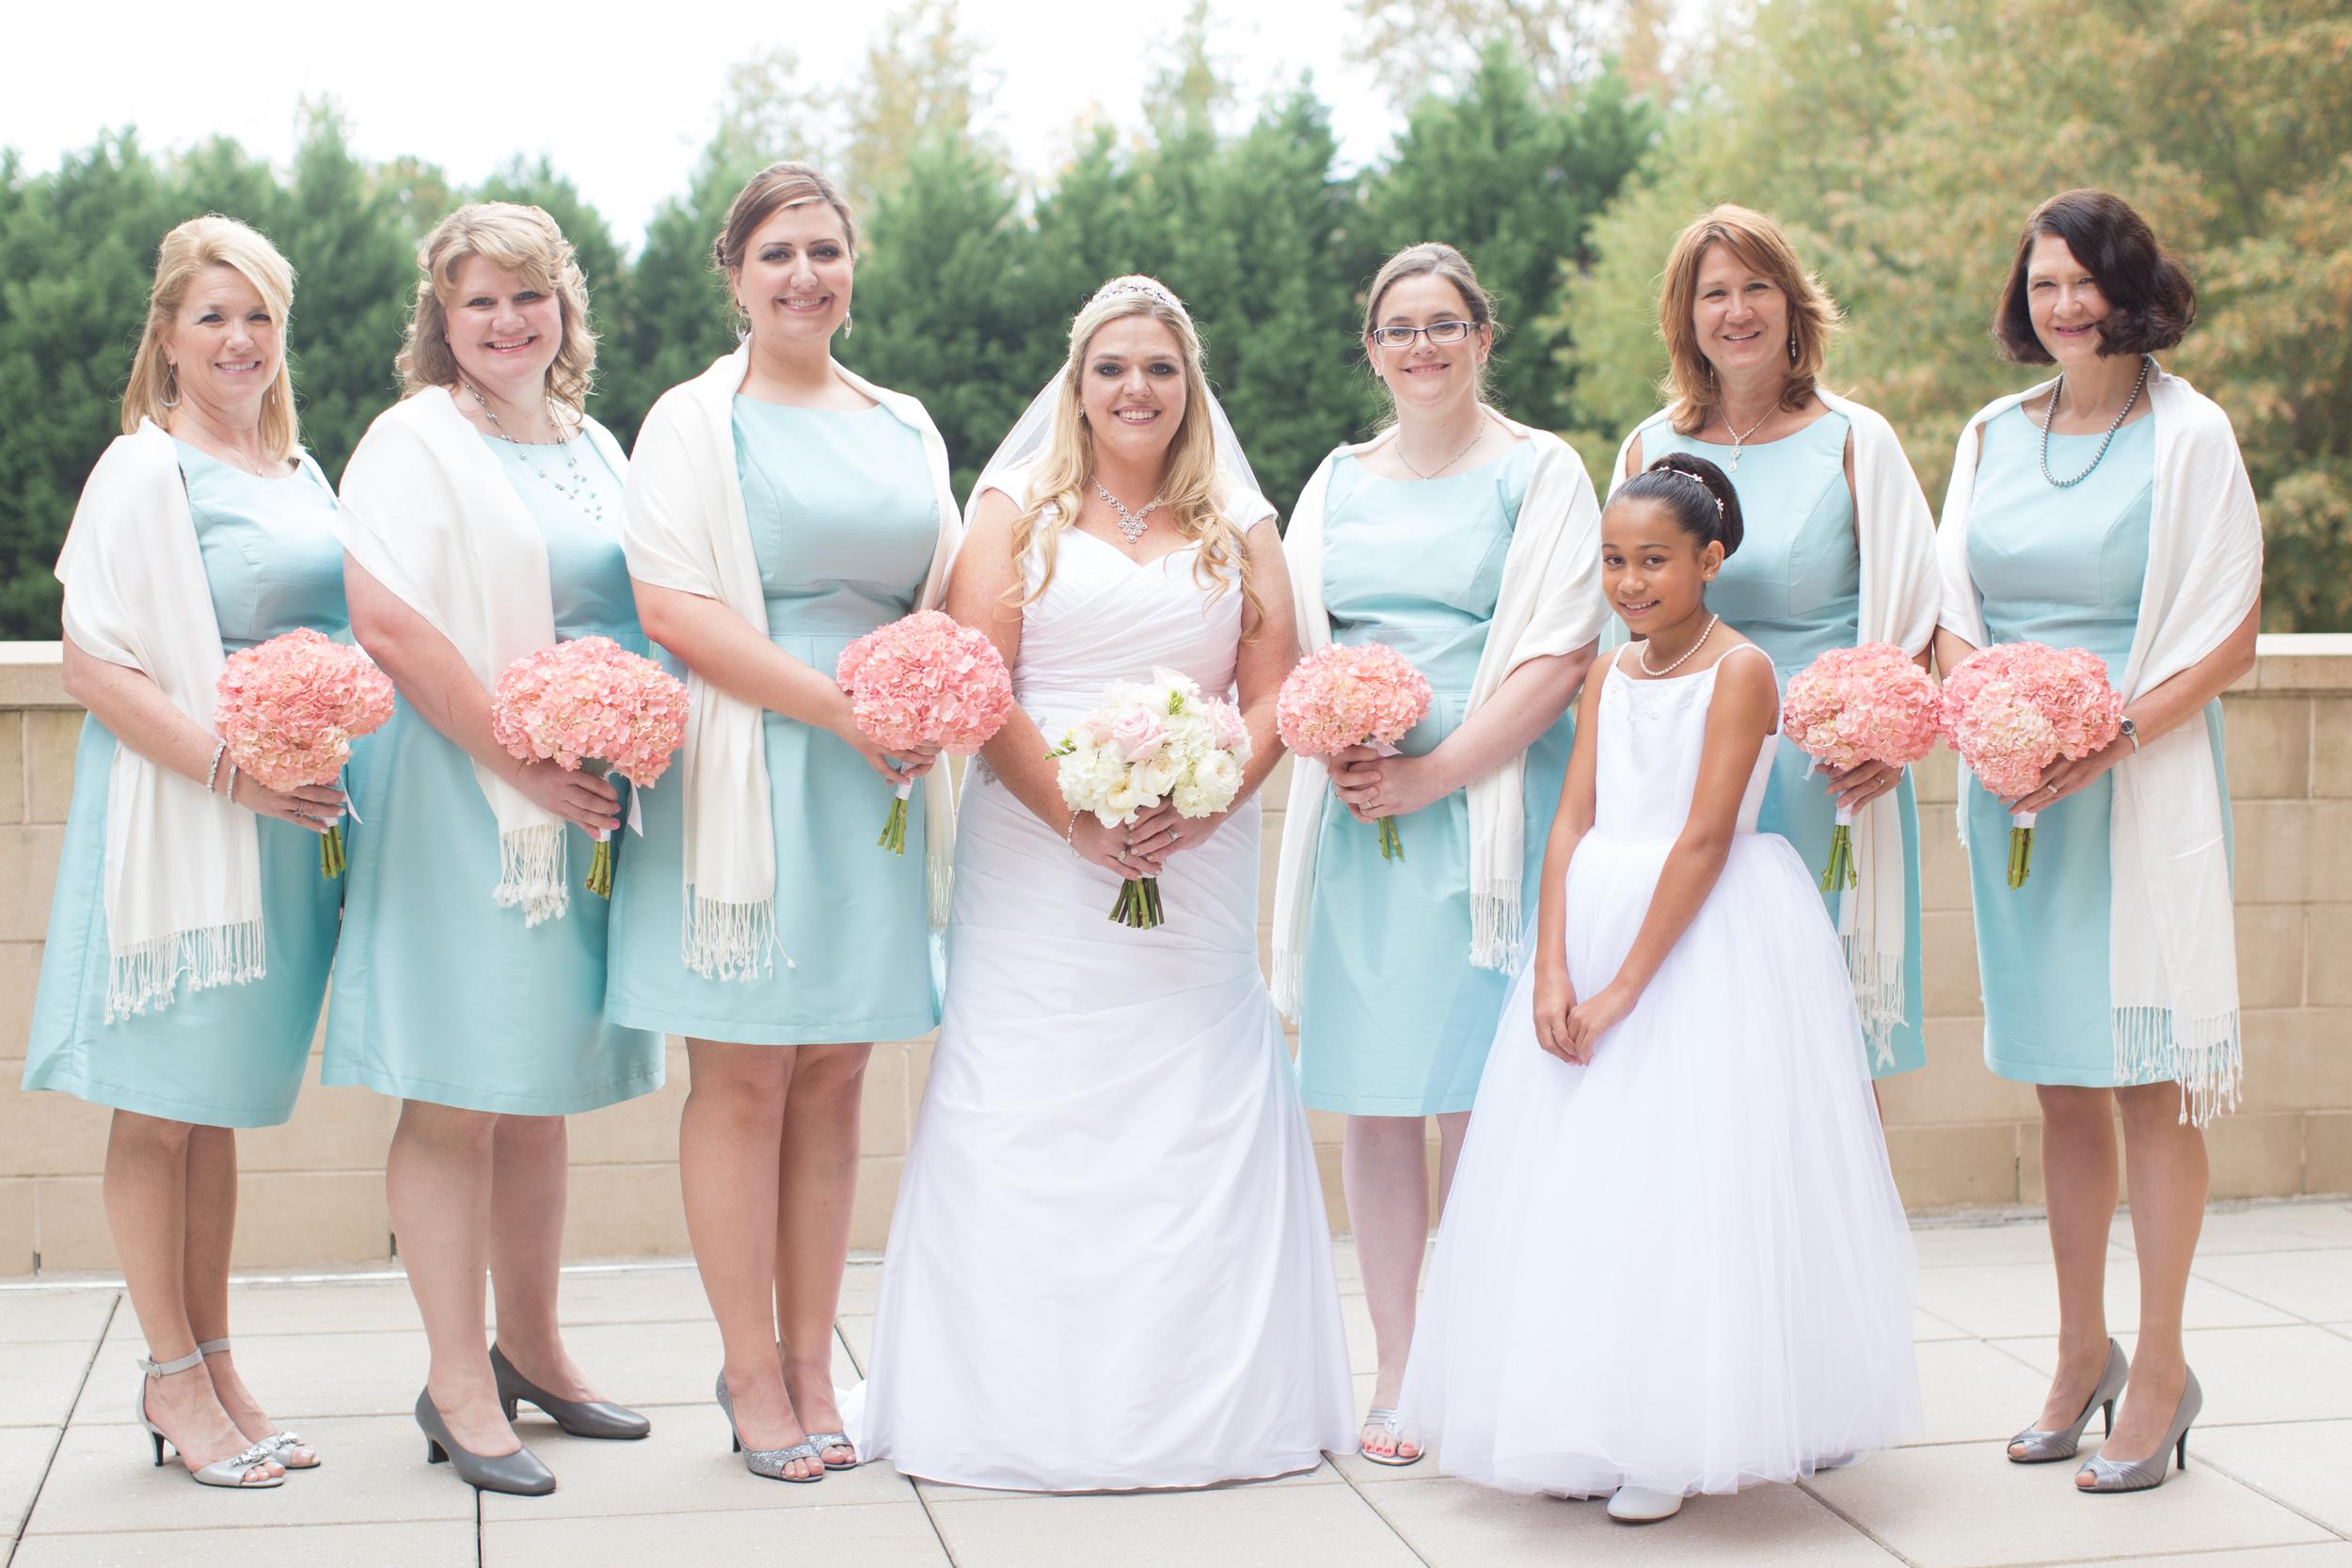 Hough_Wedding_North_Carolina_Charlotte_JonCourvillePhotography-305.jpg